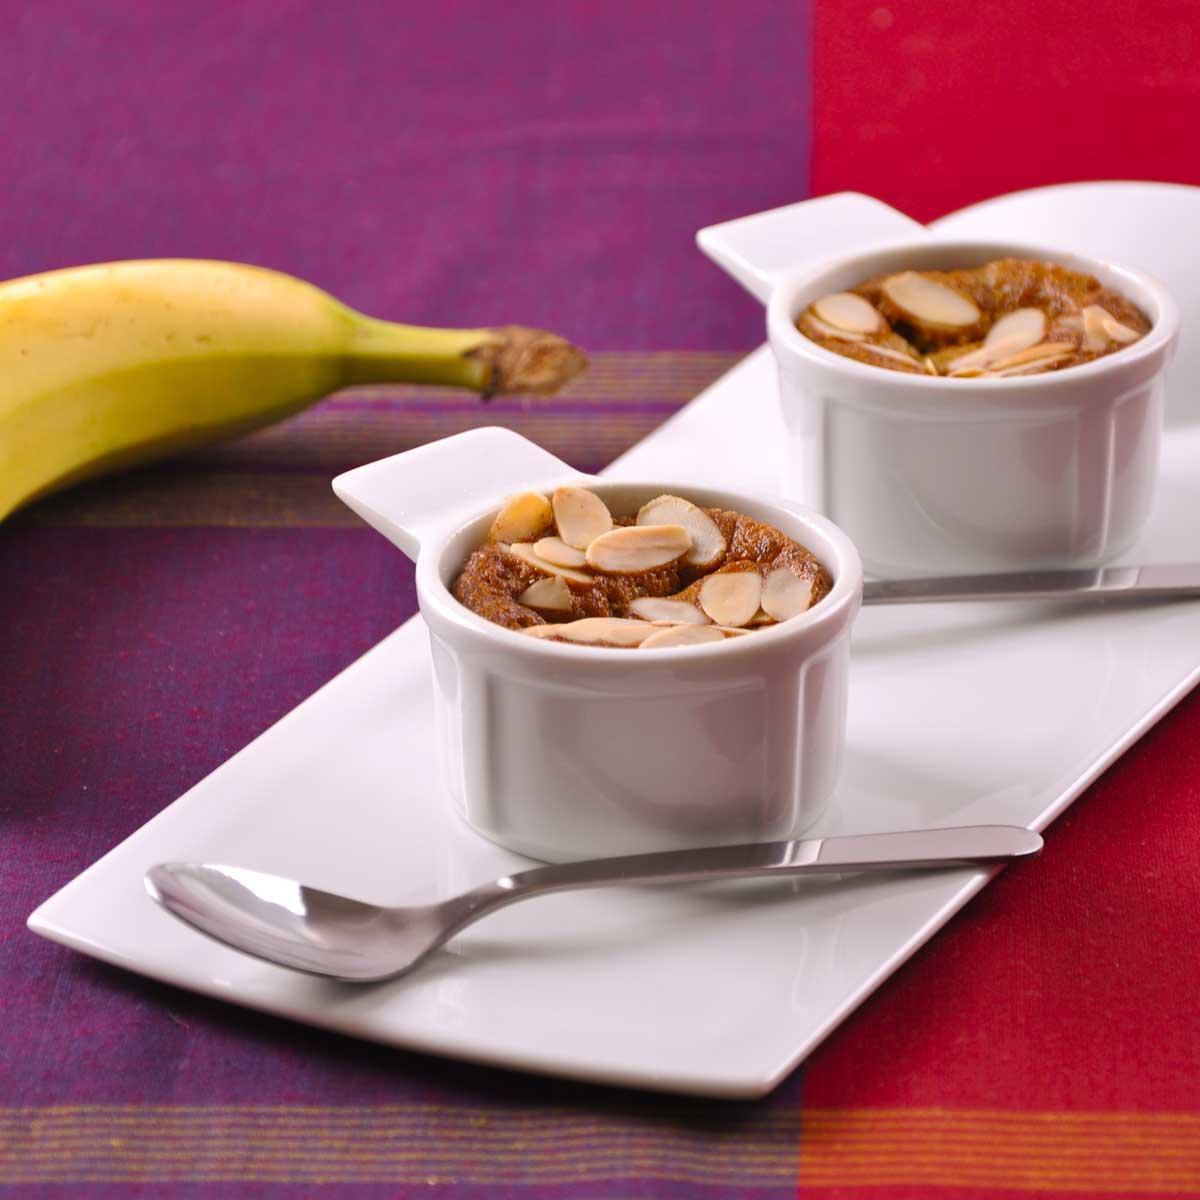 Recette g teau la banane sans gluten ni uf ni lait cuisine madame figaro - Gateau a la banane sans oeuf ...